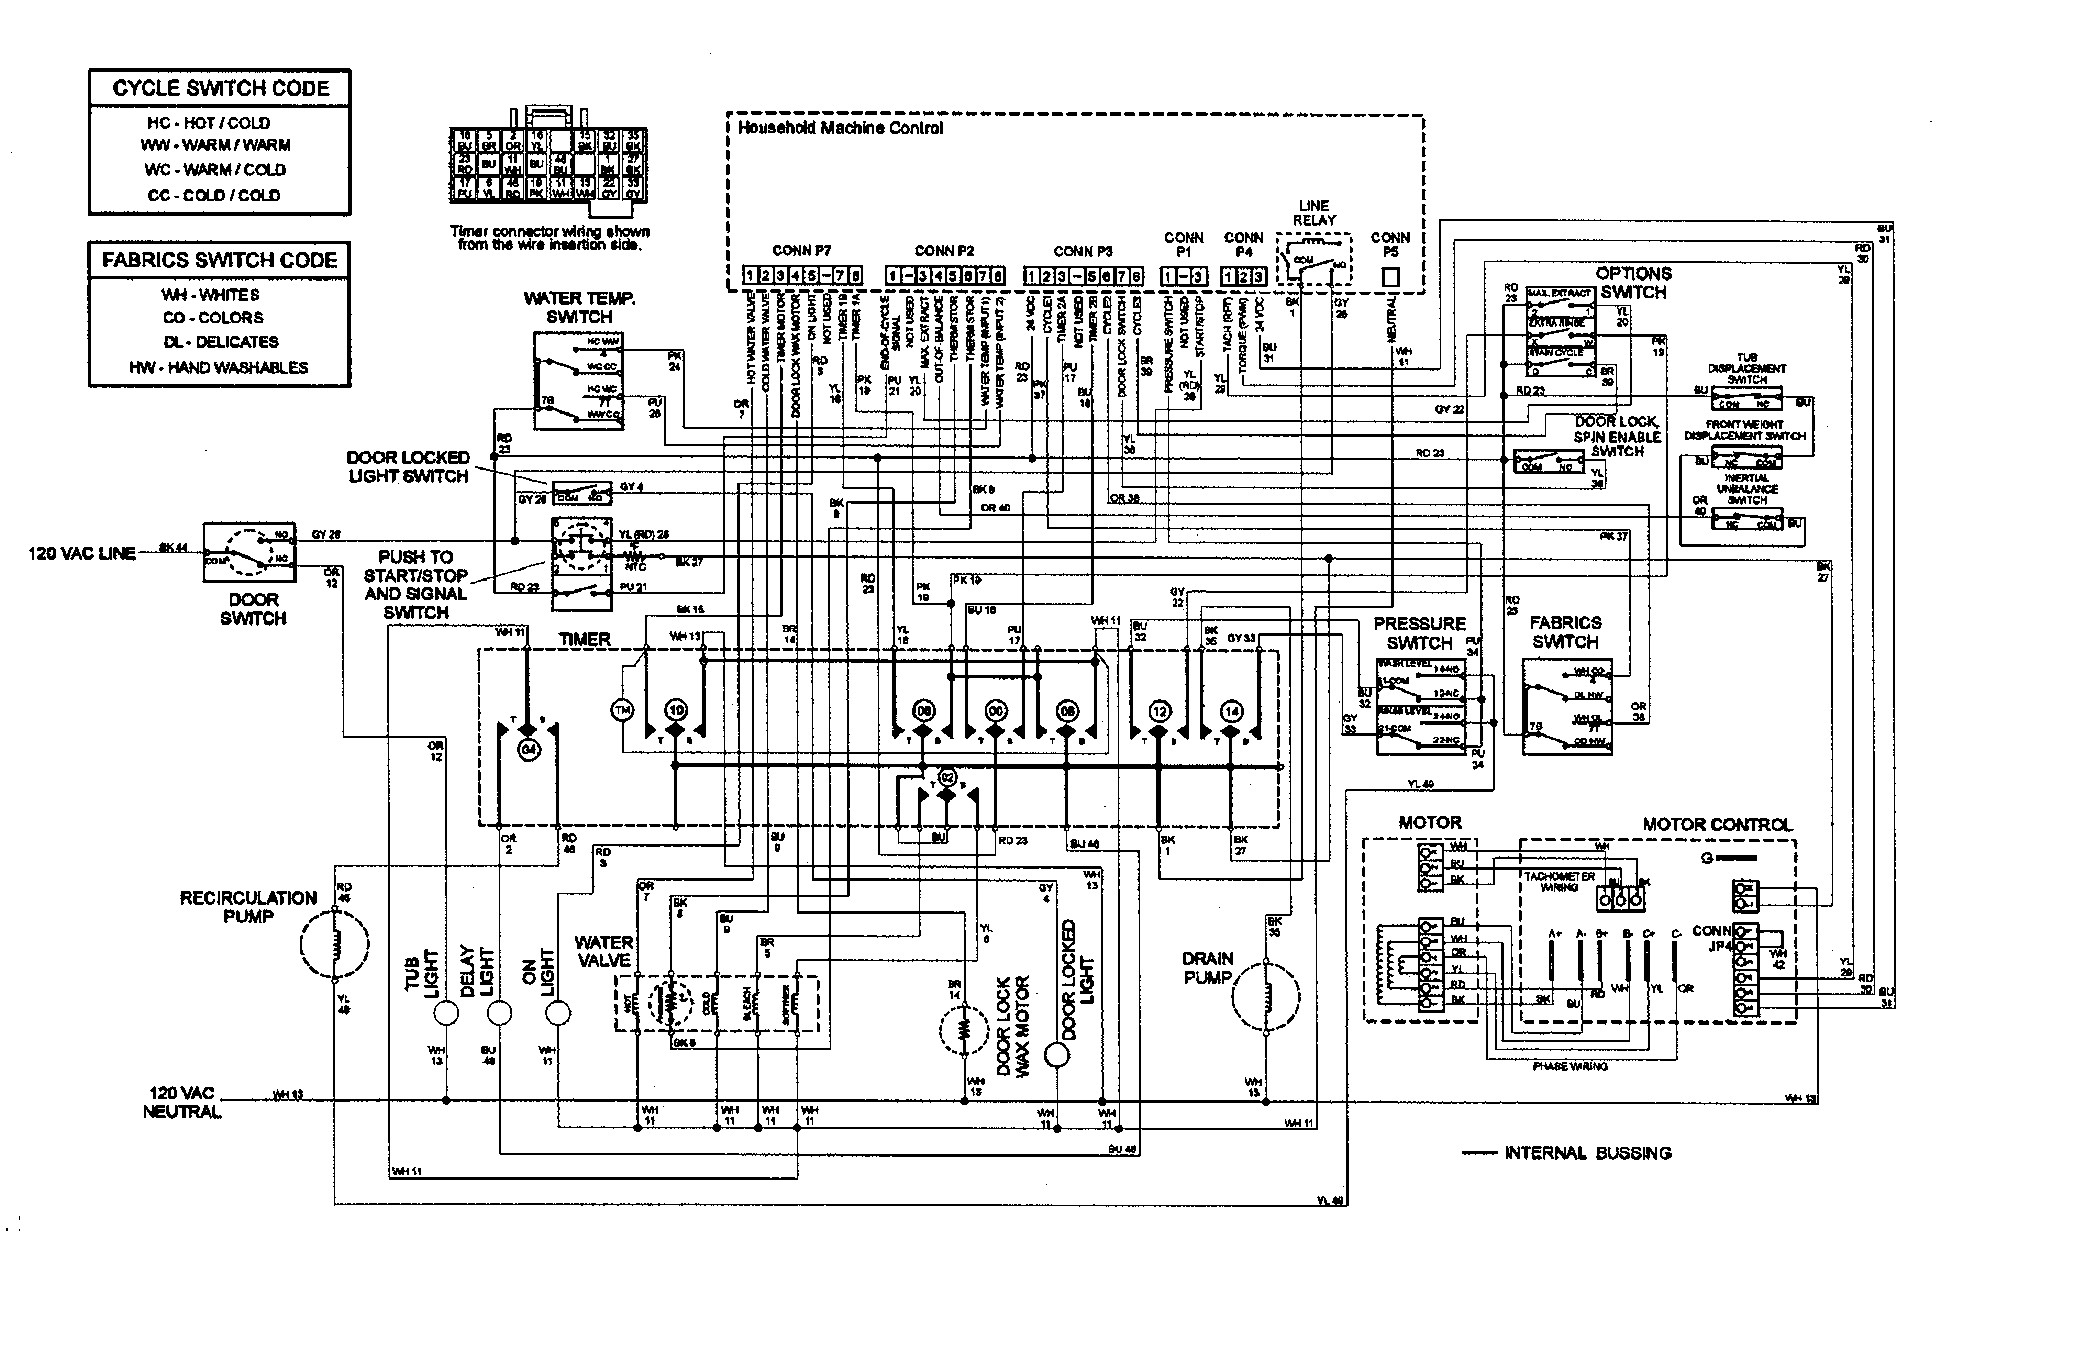 maytag diagrams et 8478  performa washer parts diagram together with control  et 8478  performa washer parts diagram